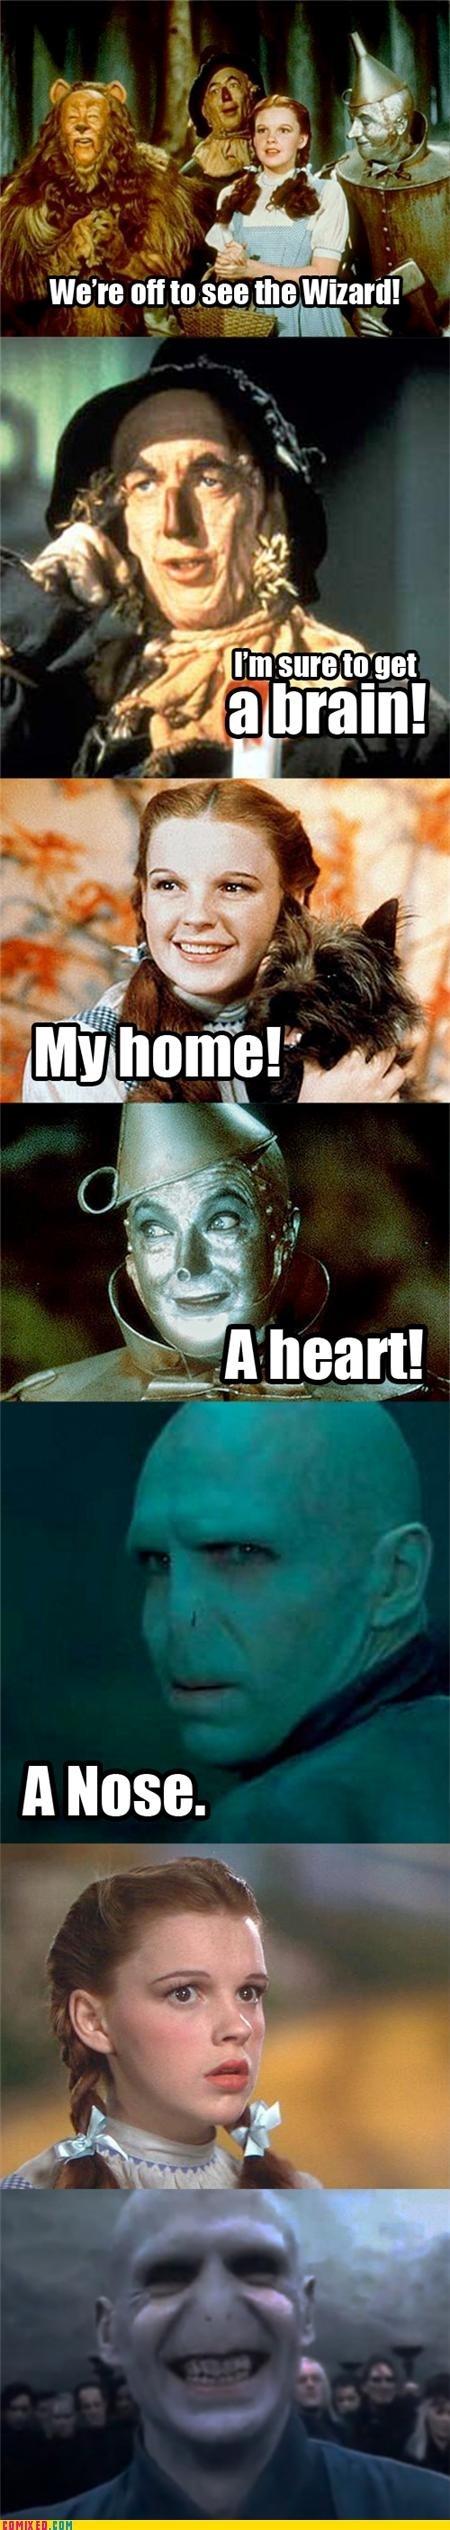 Voldemort_WizardofOz